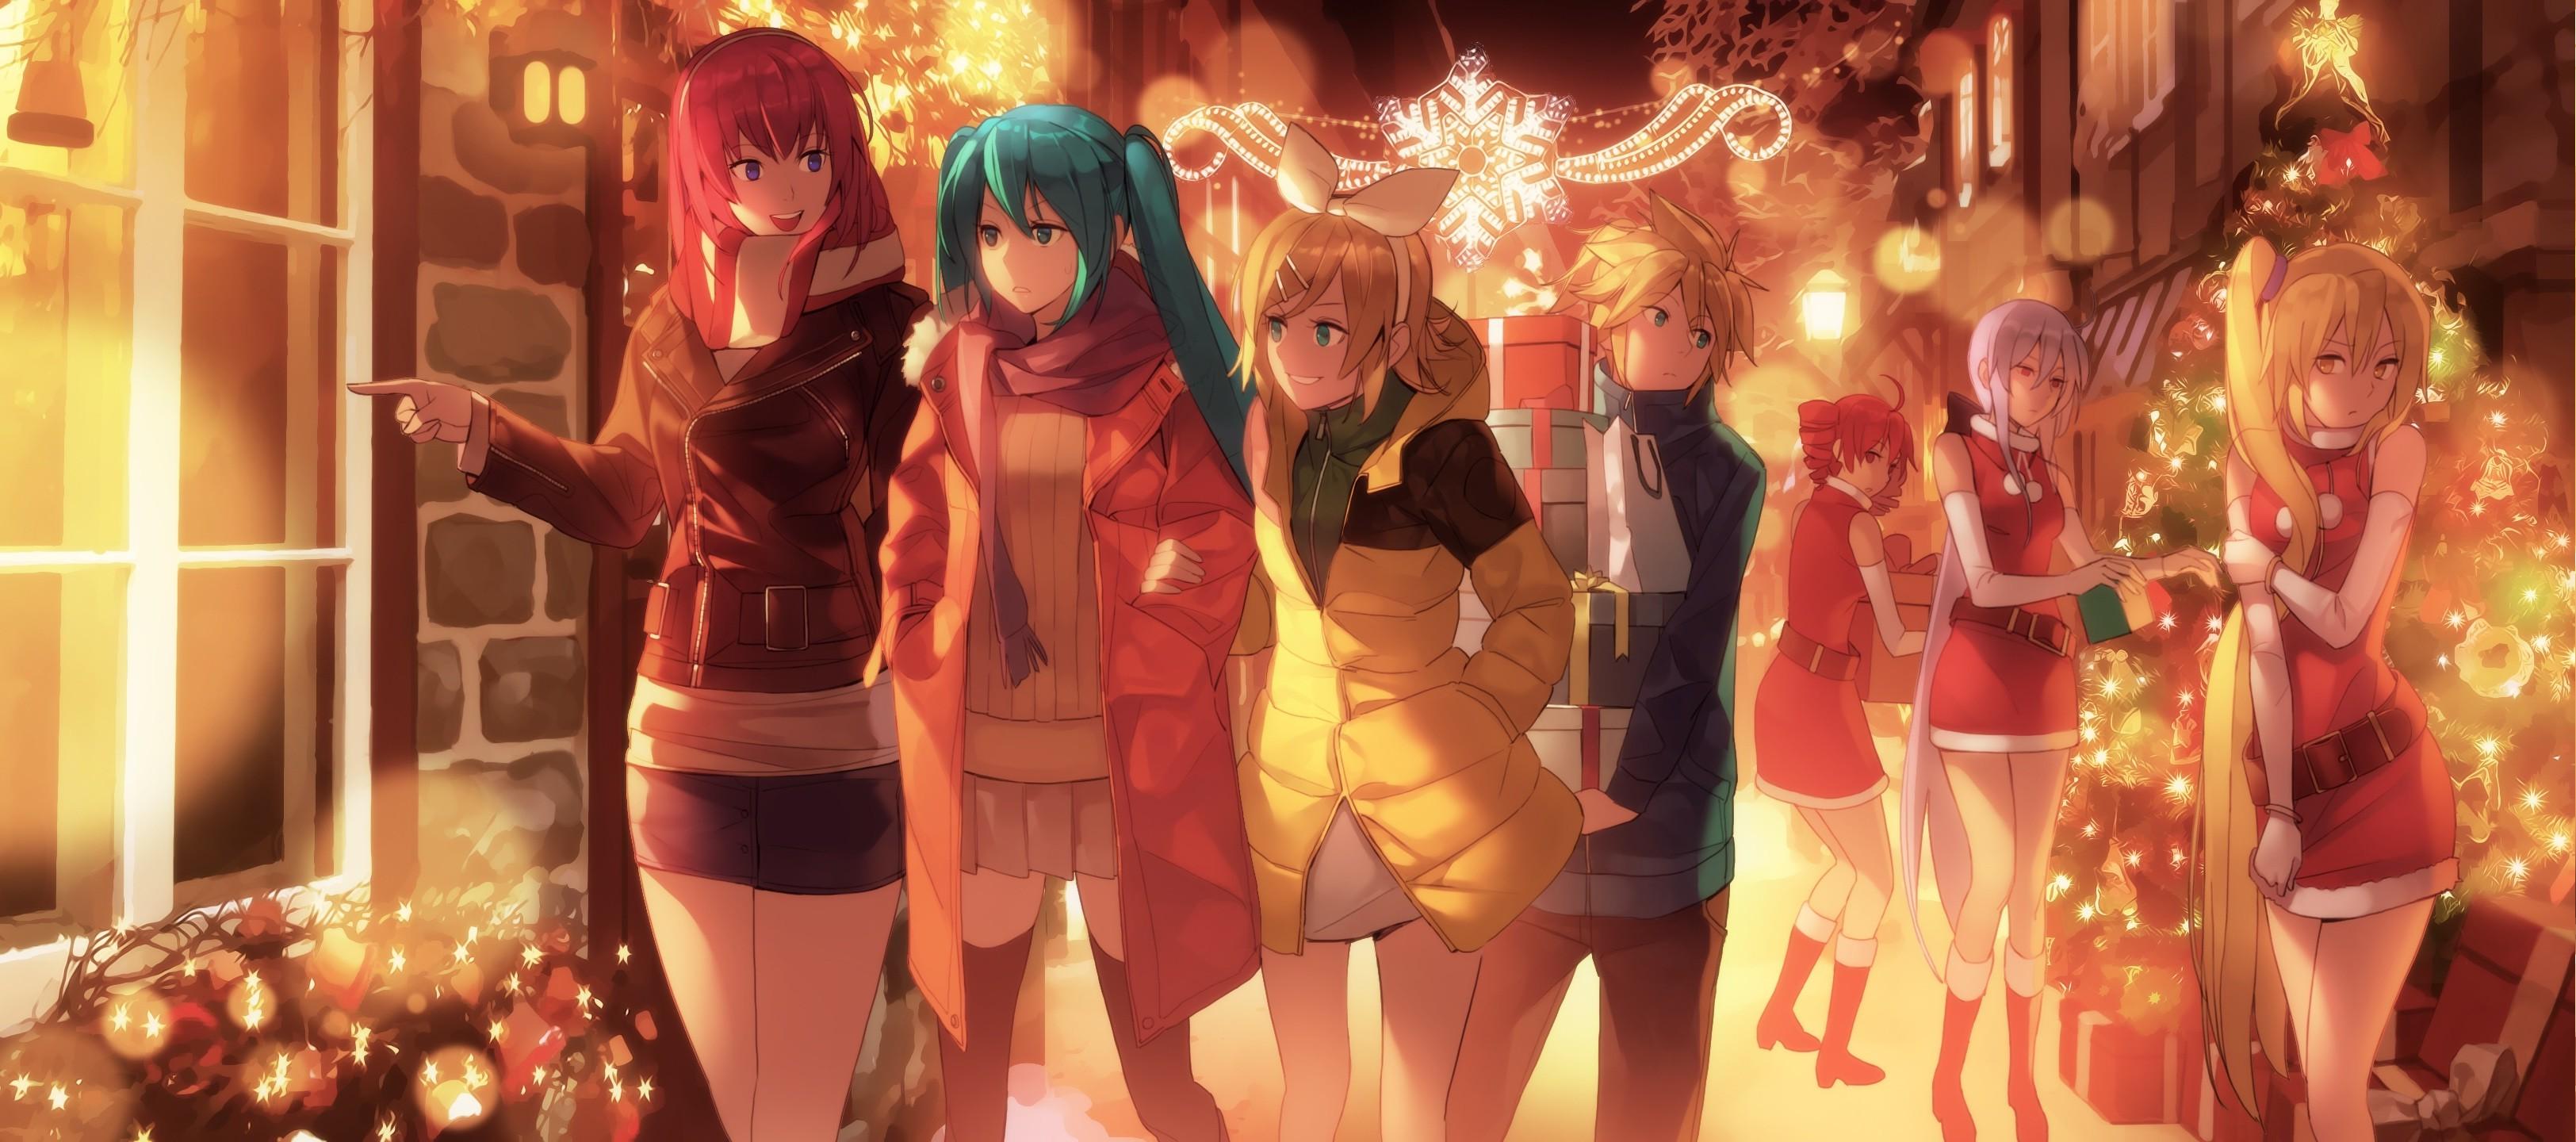 wallpaper : anime, vocaloid, hatsune miku, christmas tree, kagamine